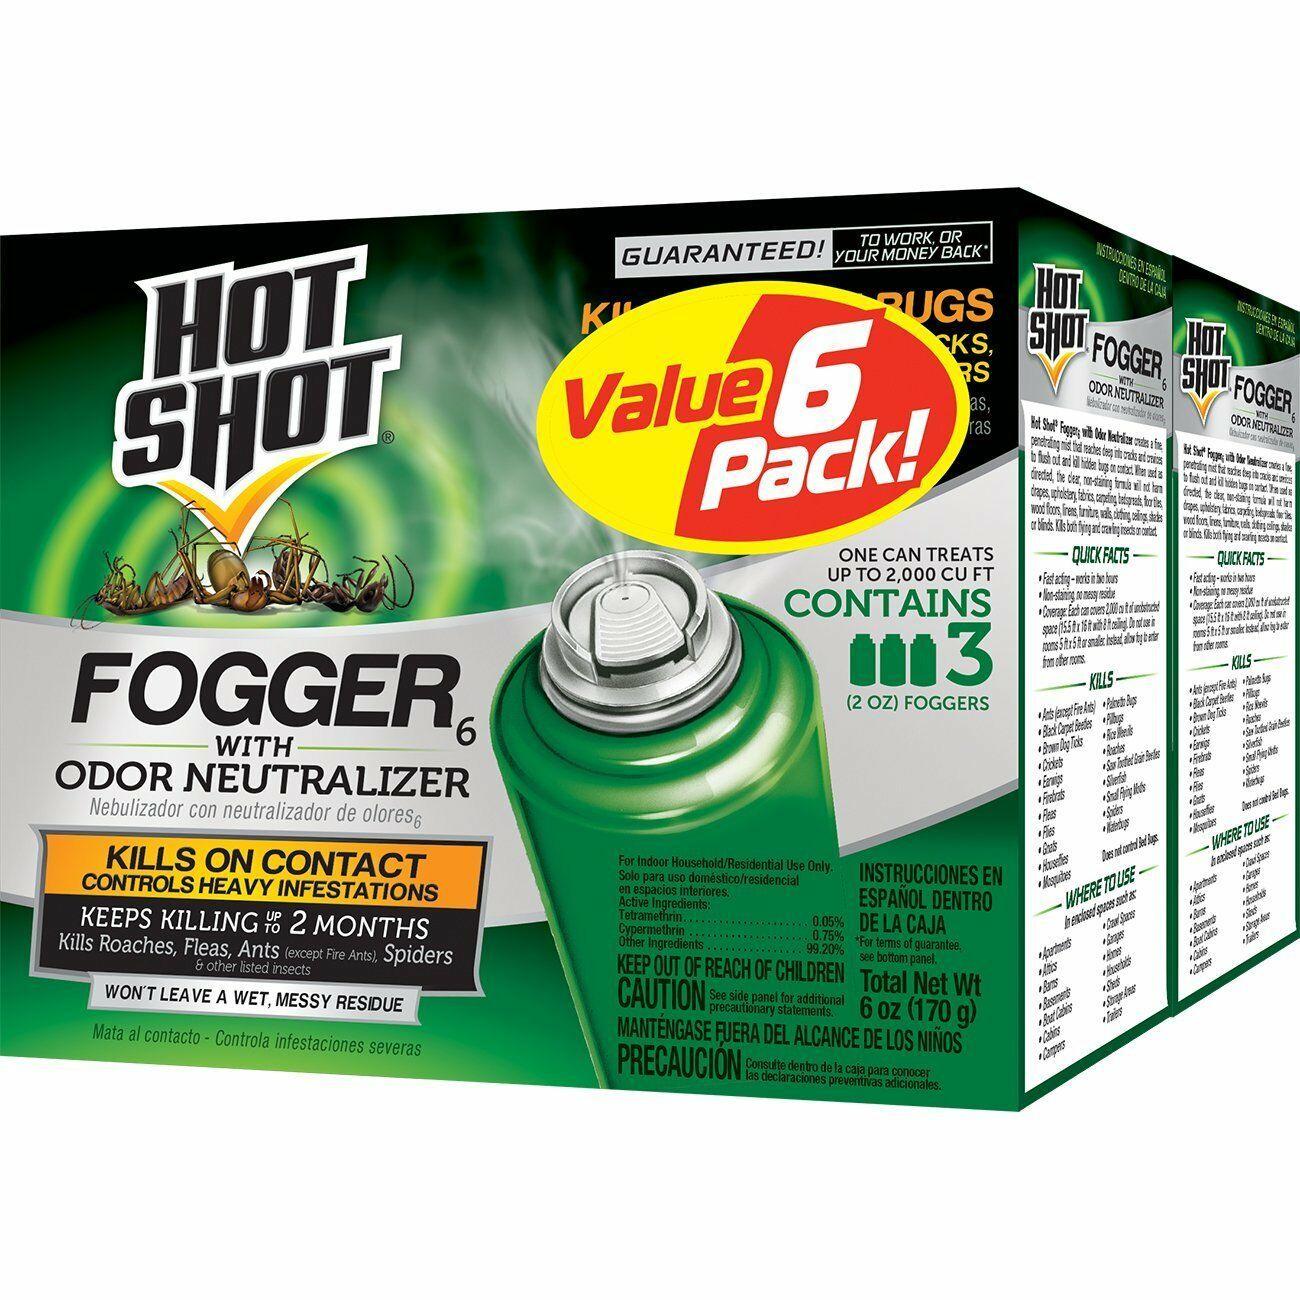 Hot Shot Fogger6 With Odor Neutralizer HG26180 2 Pack 3